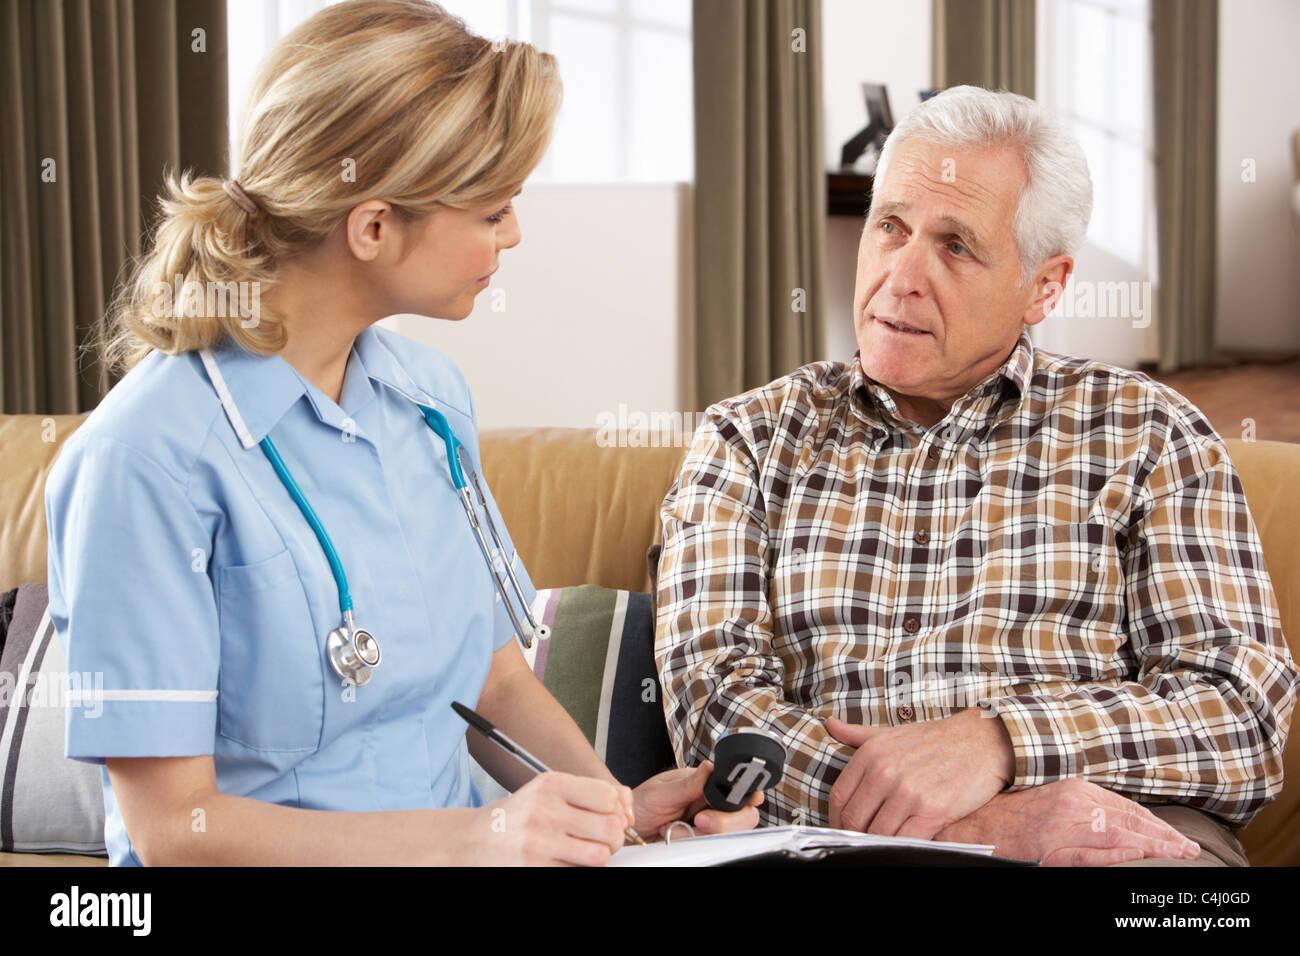 Senior Man Talking To Health Visitor At Home - Stock Image